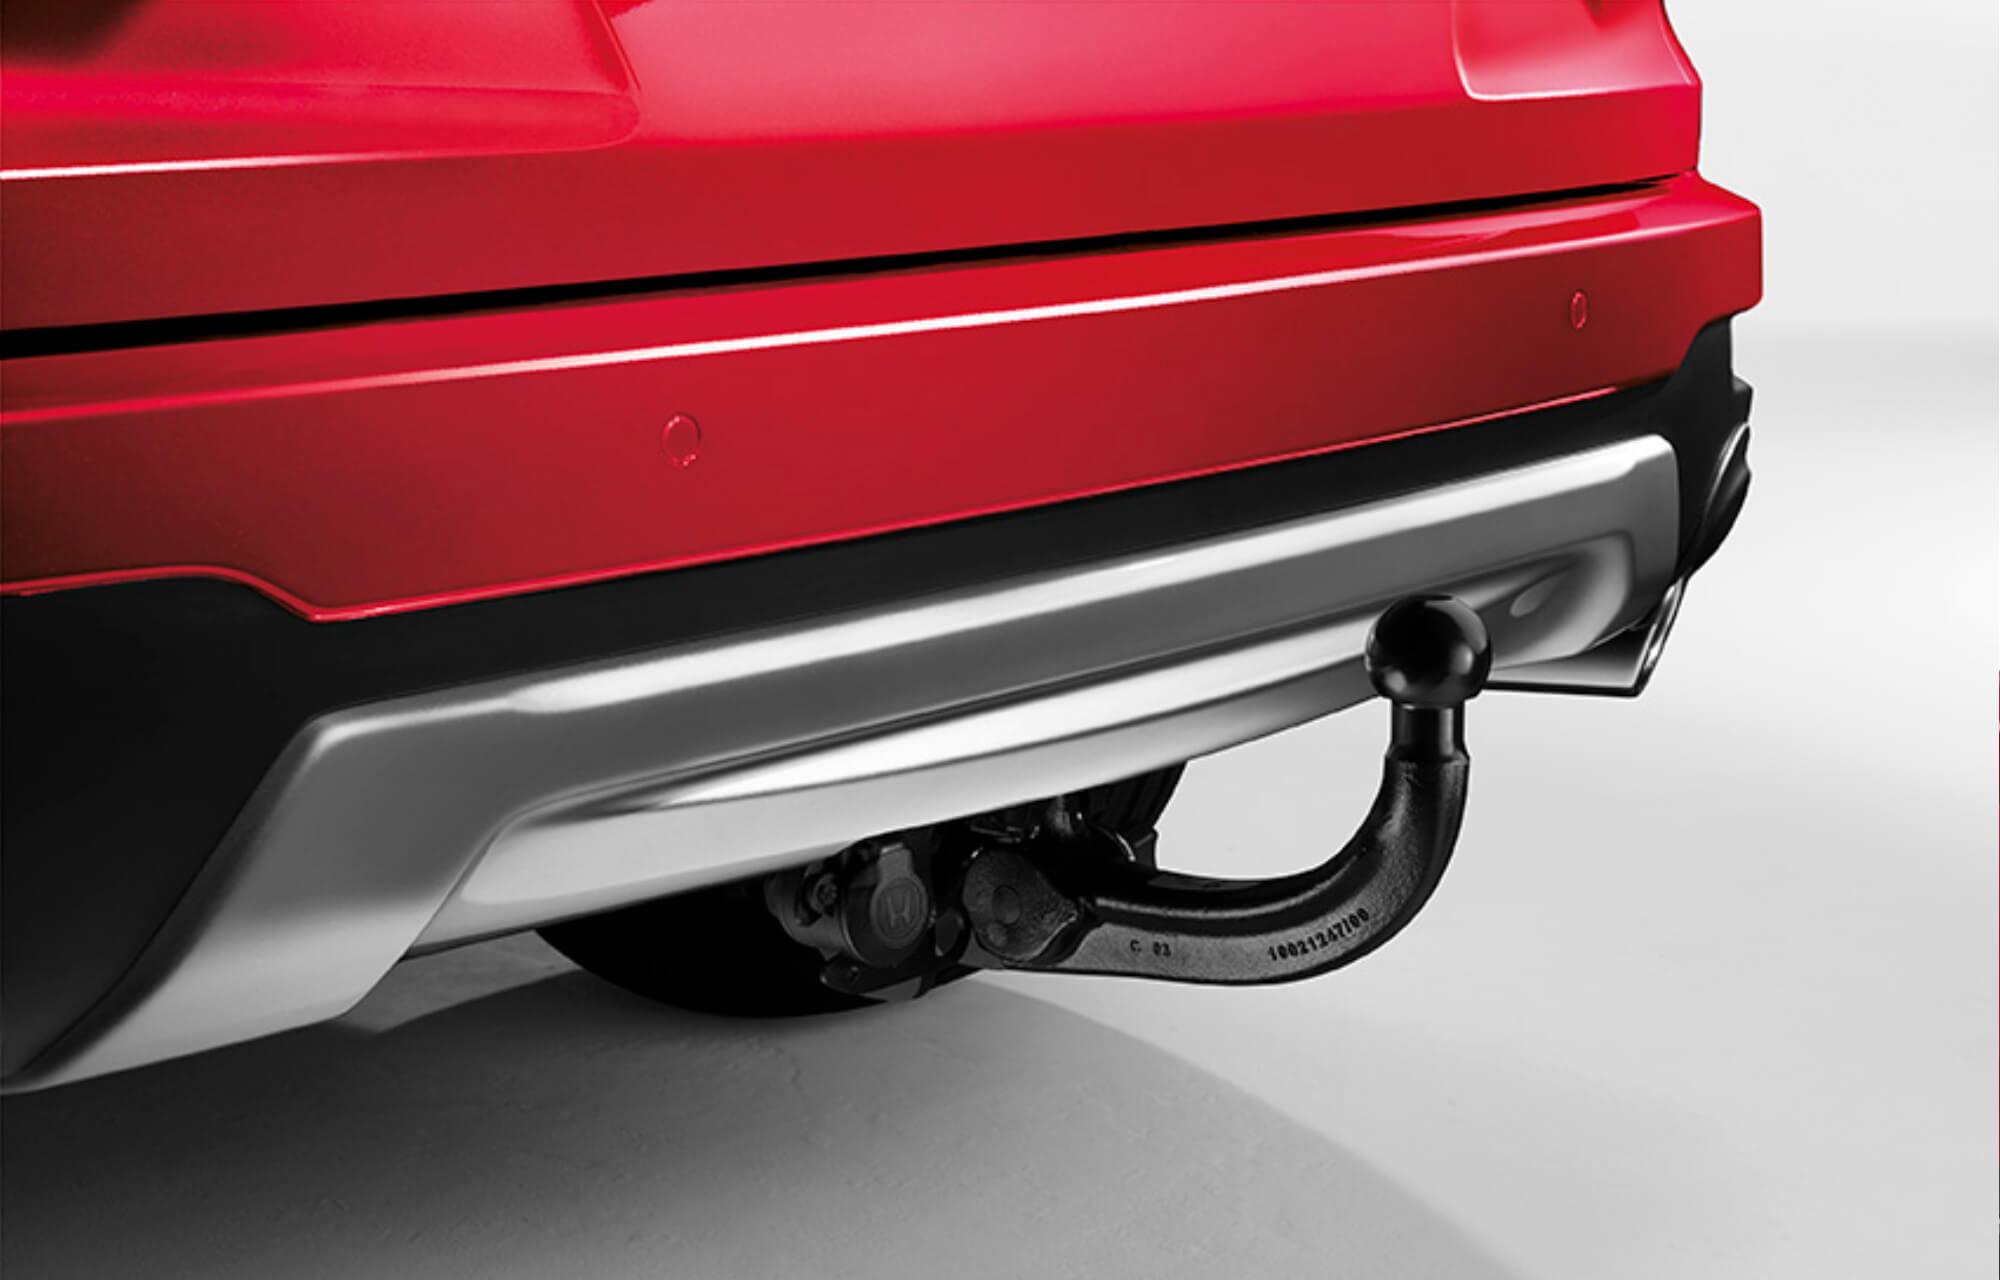 CR-V Detachable Tow Bar